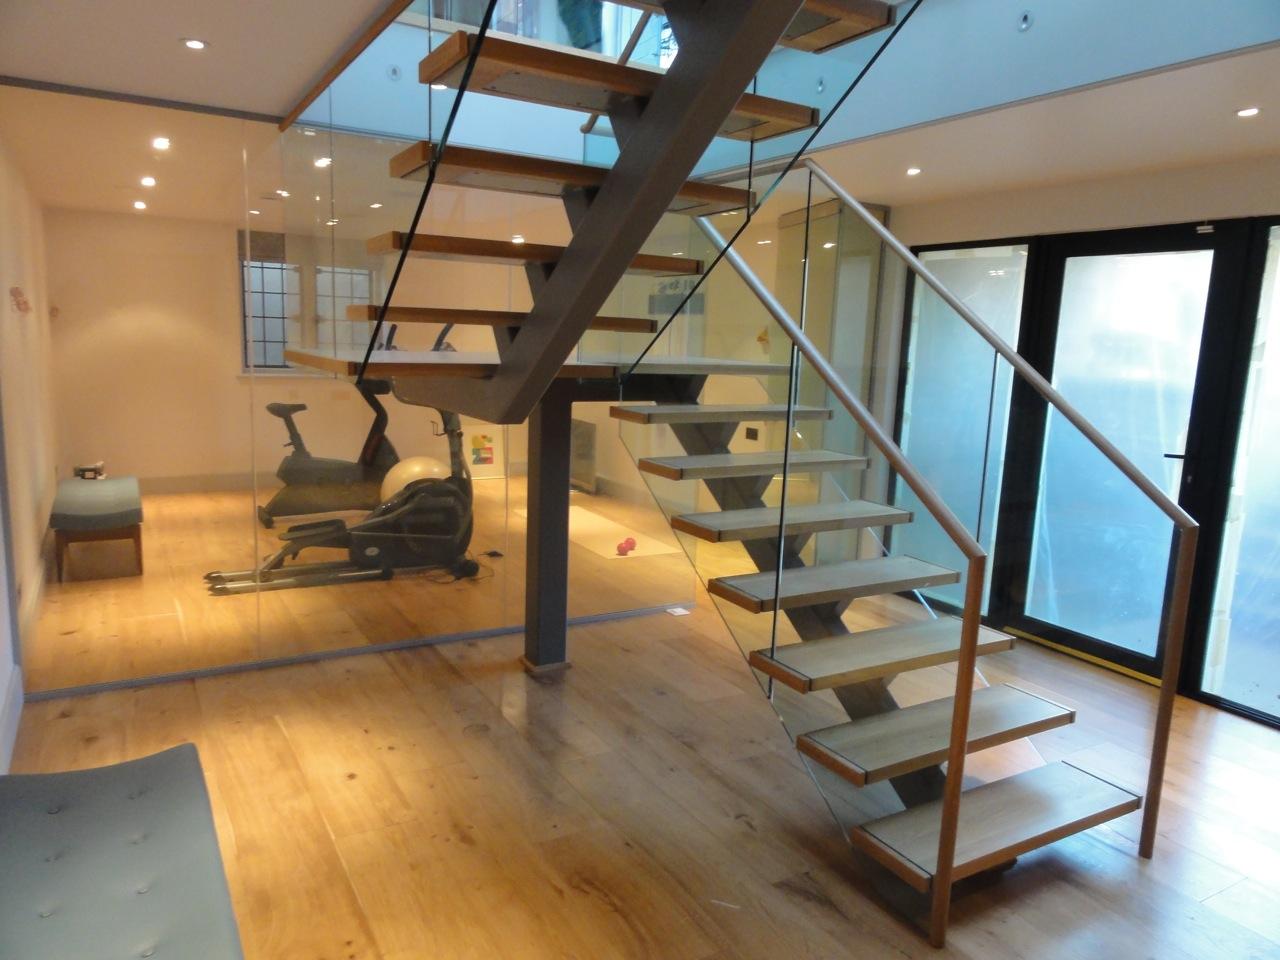 Spinal Staircase Sussex F L I G H T D E S I G N